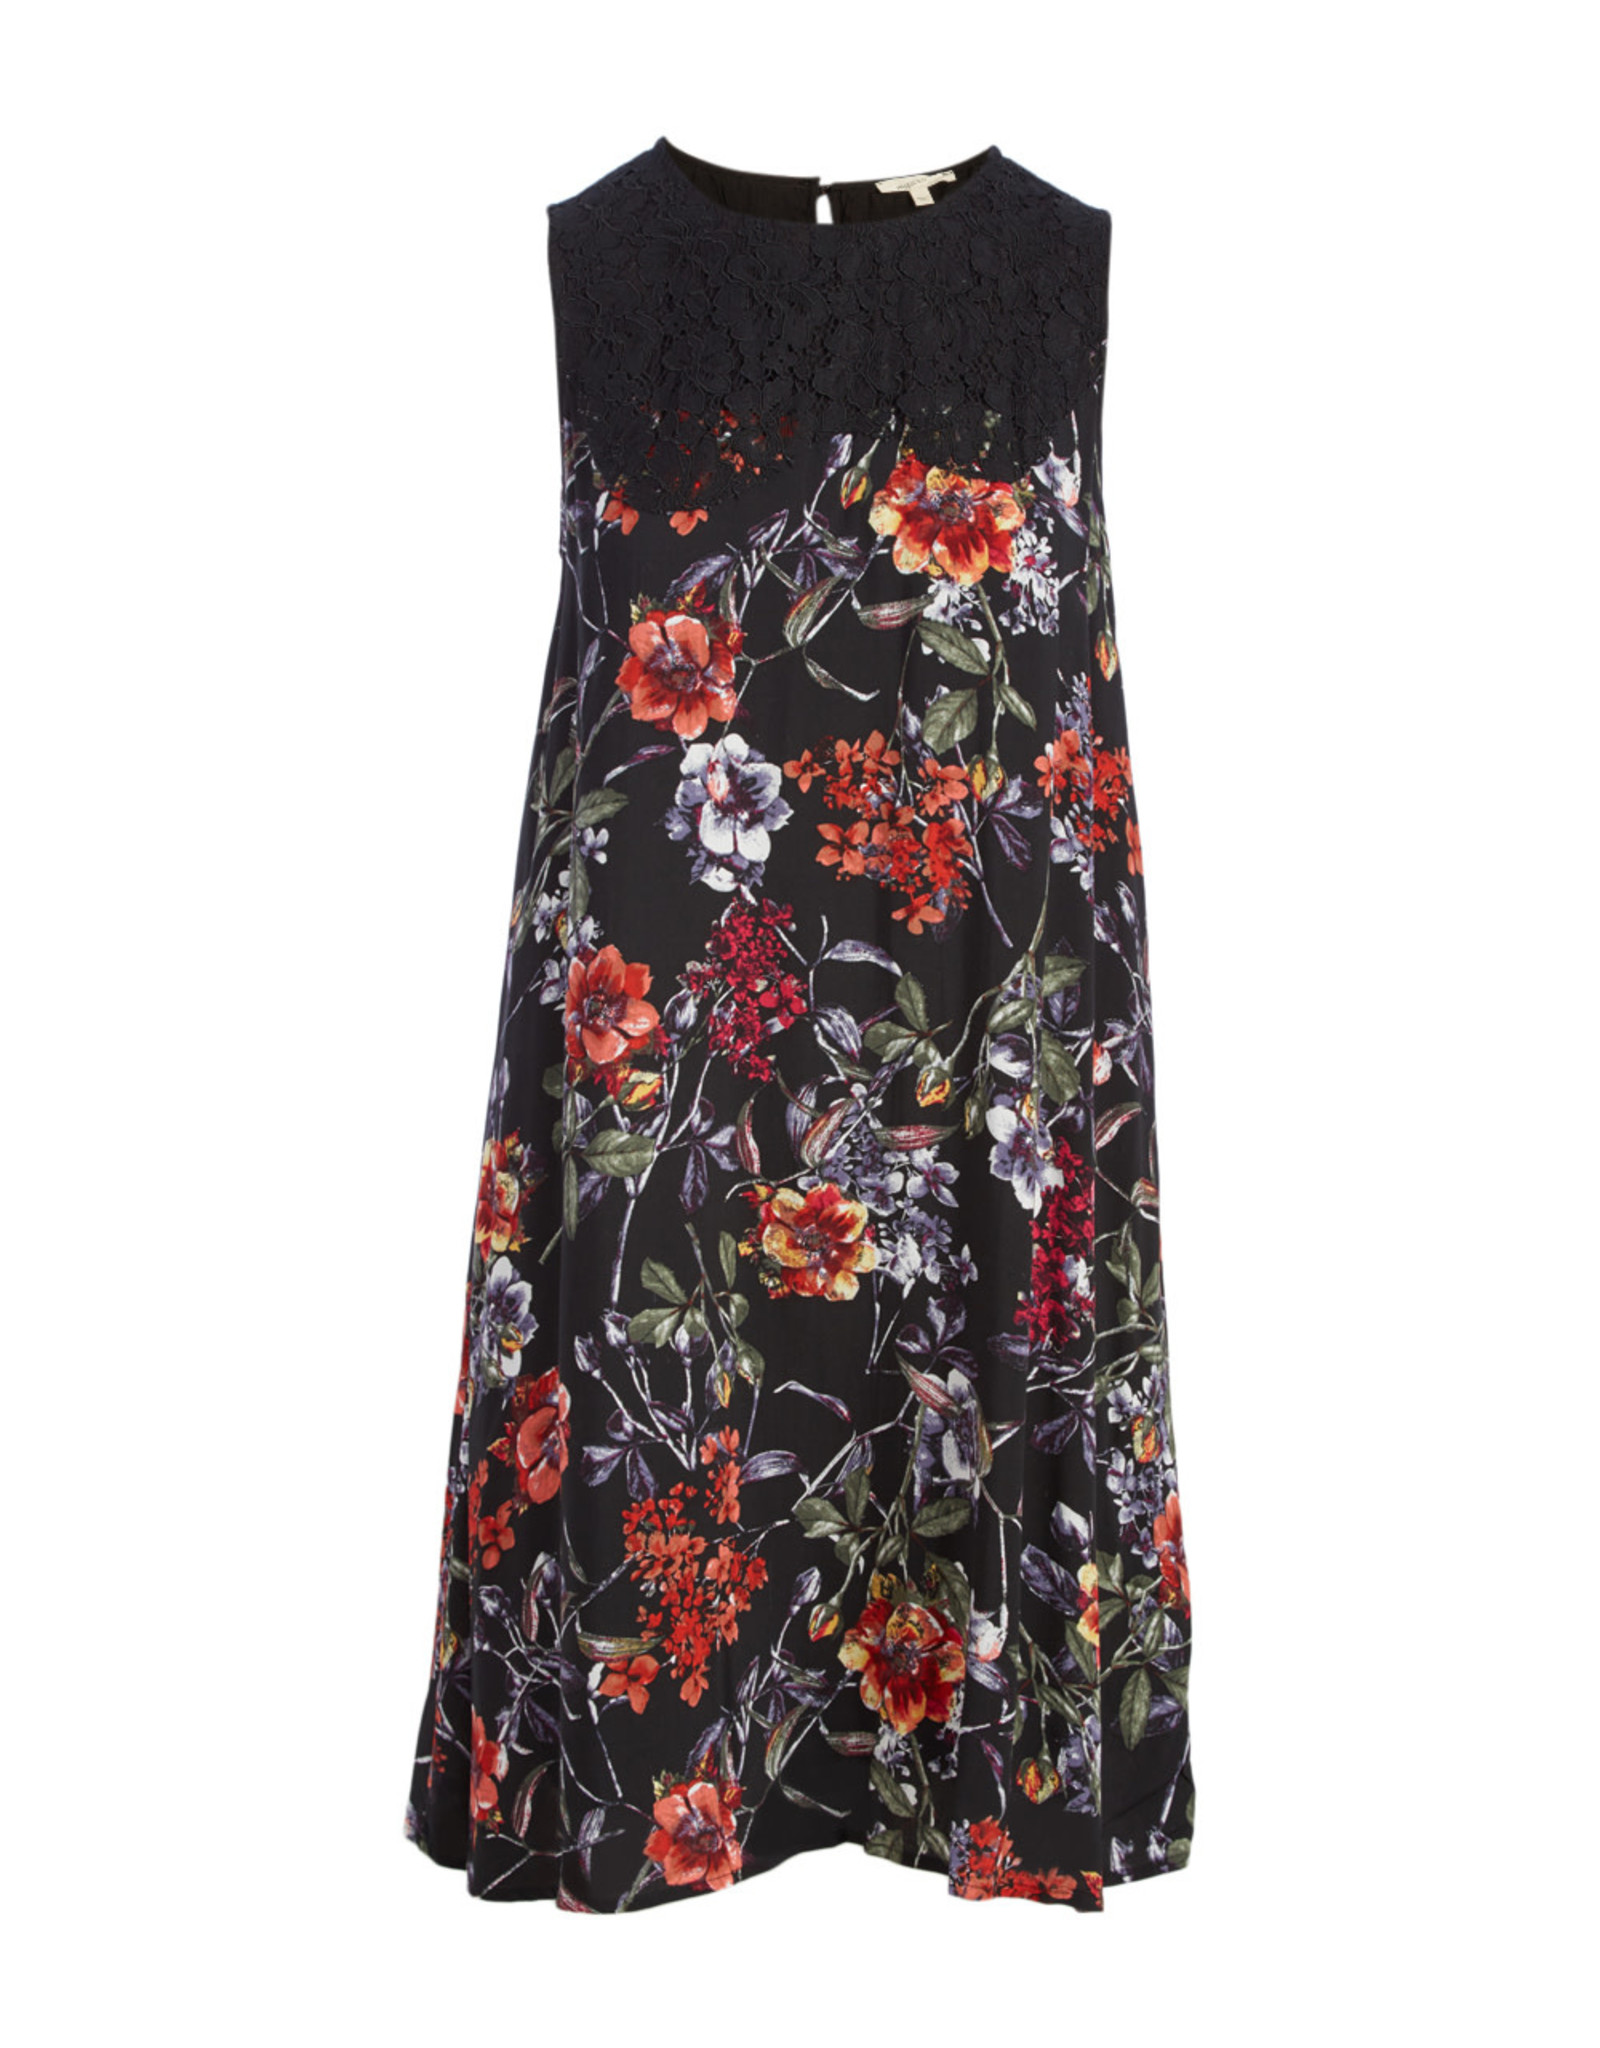 BLACK FLORAL LACE YOKE SLEEVELESS DRESS